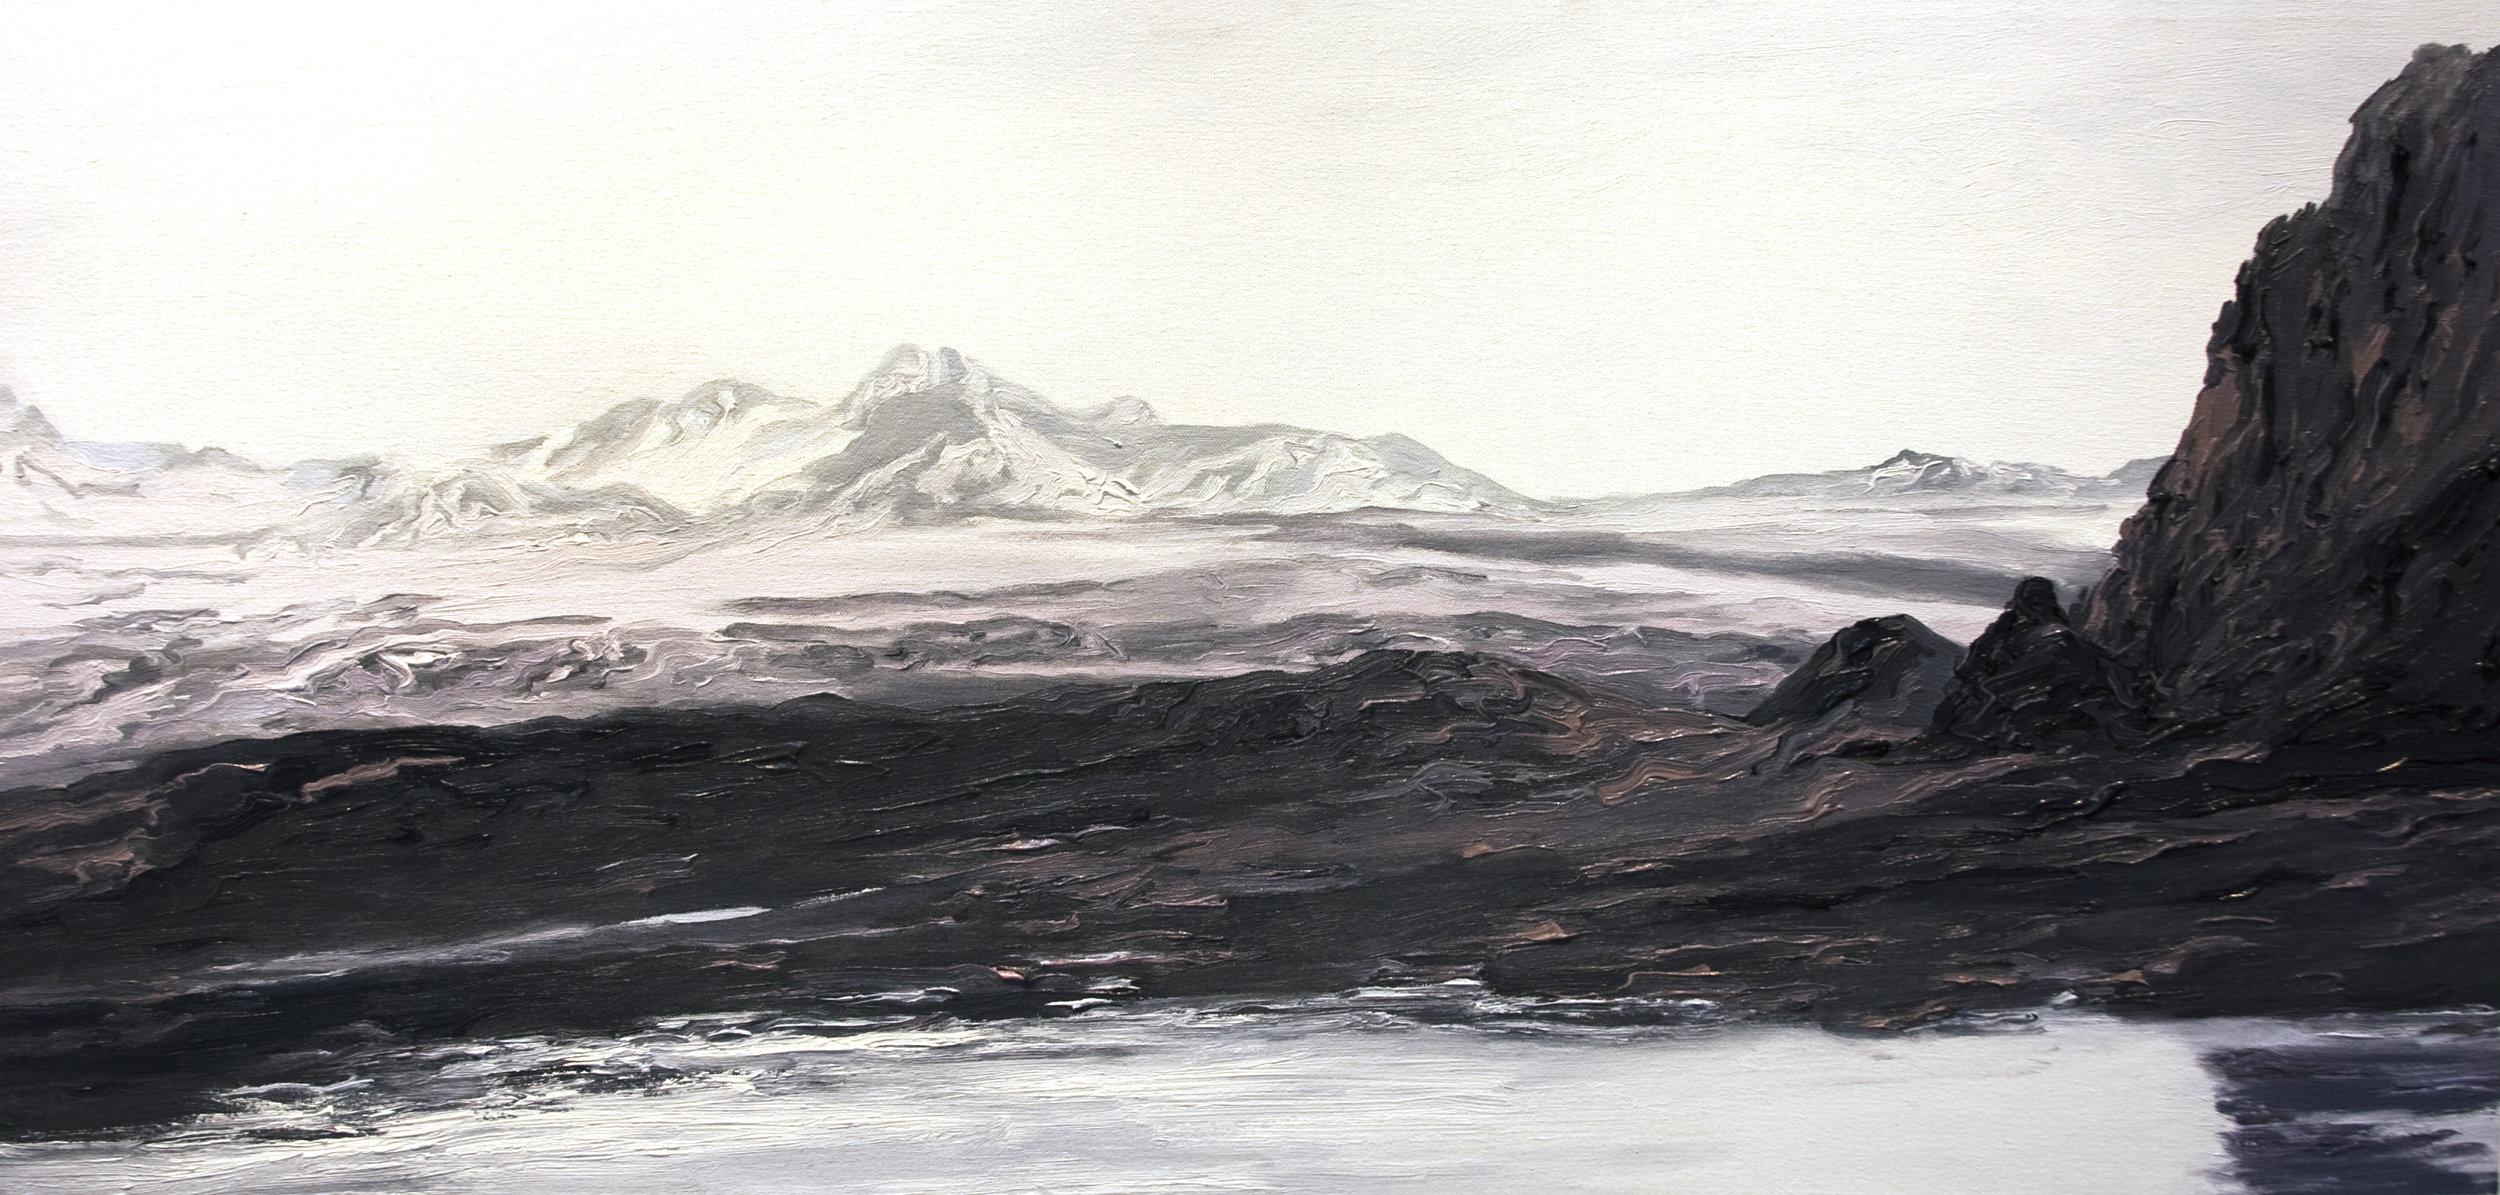 Bear Glacier #1, 1909, after Ulysees S. Grant